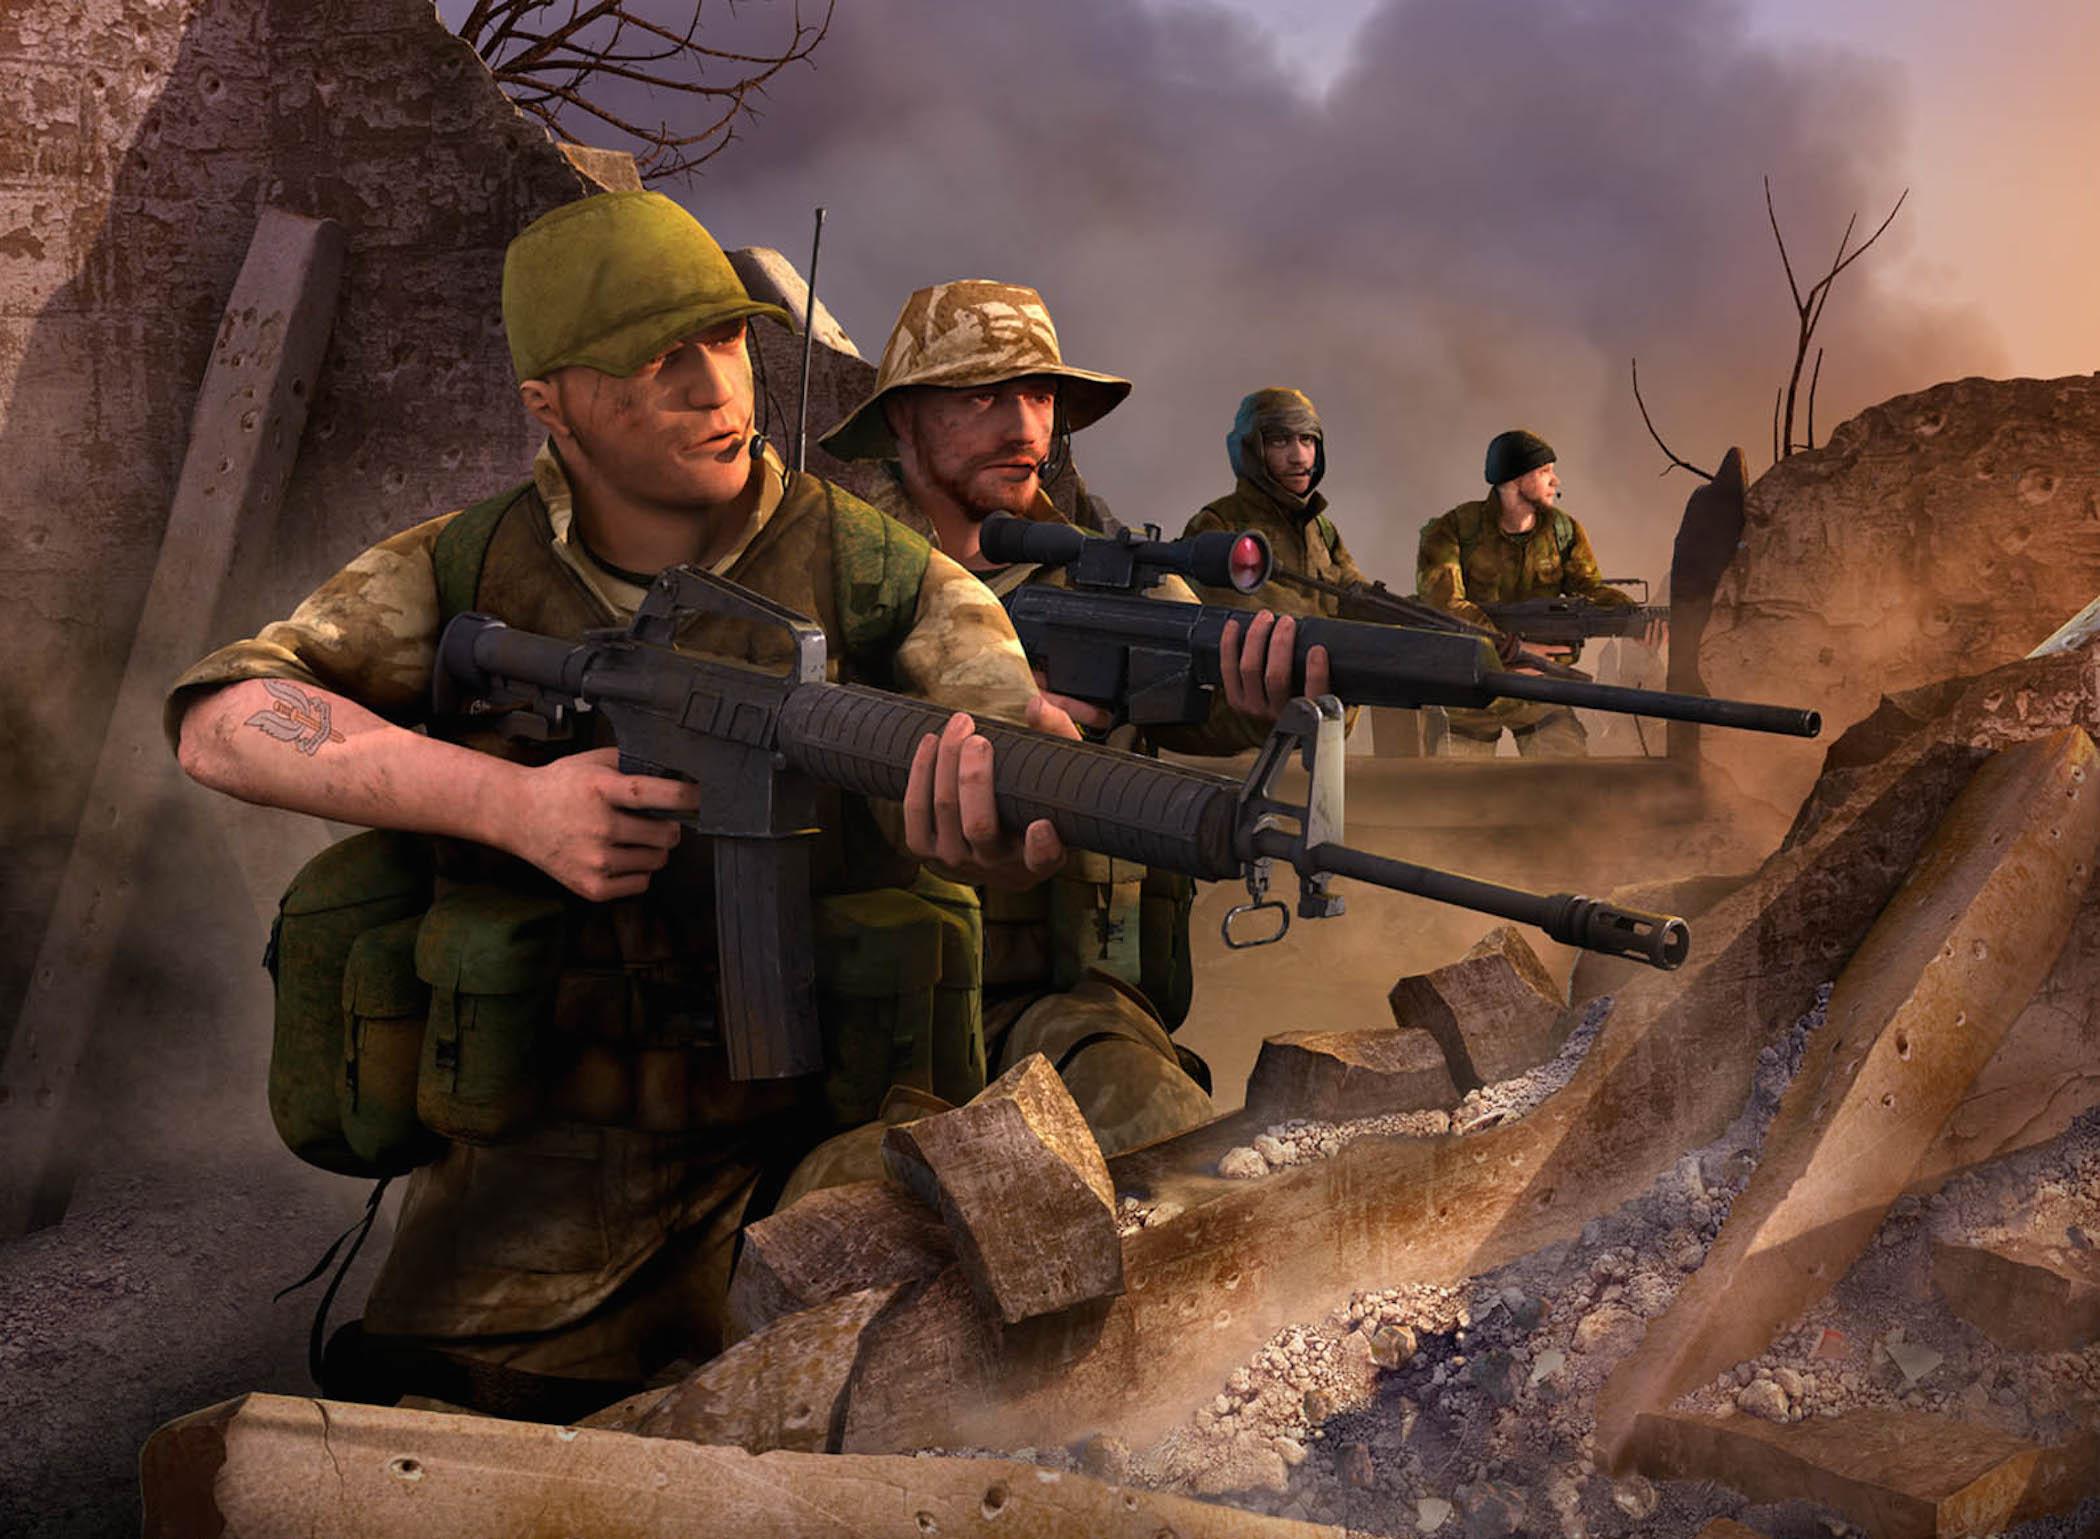 conflict desert storm 2 wallpaper free hd downloads